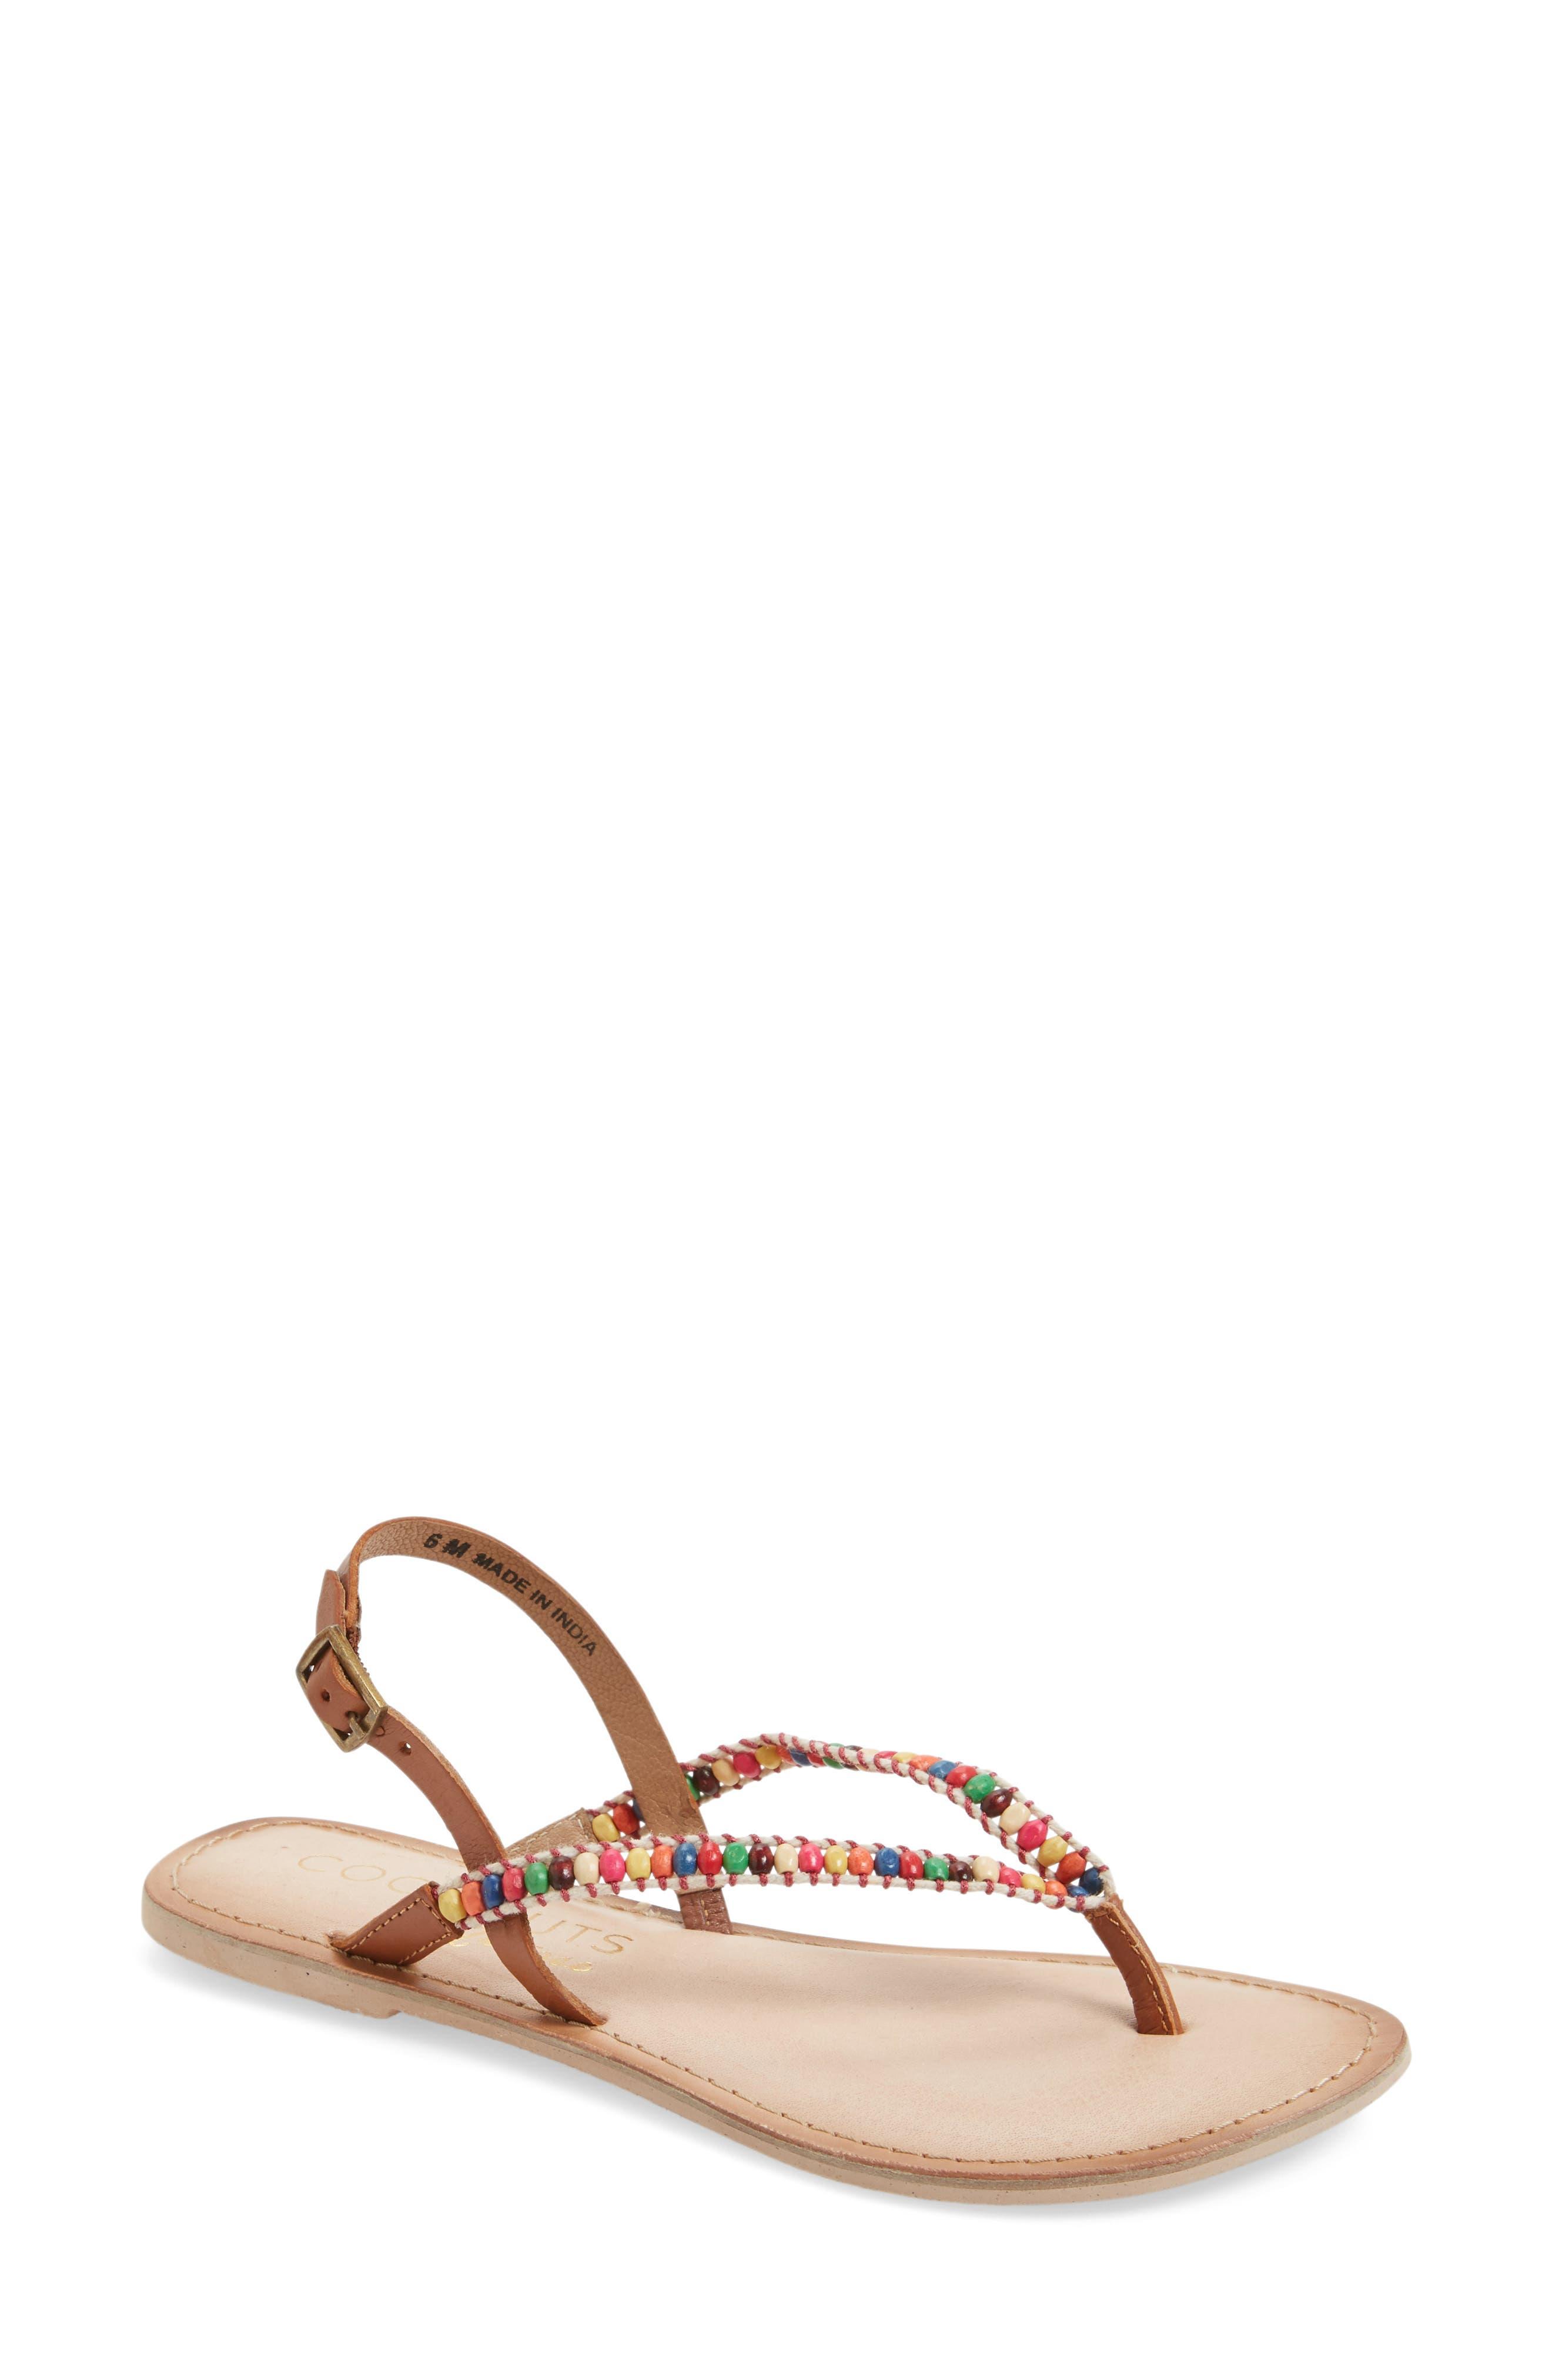 Matisse Celebration Leather Sandal qIVZQhx